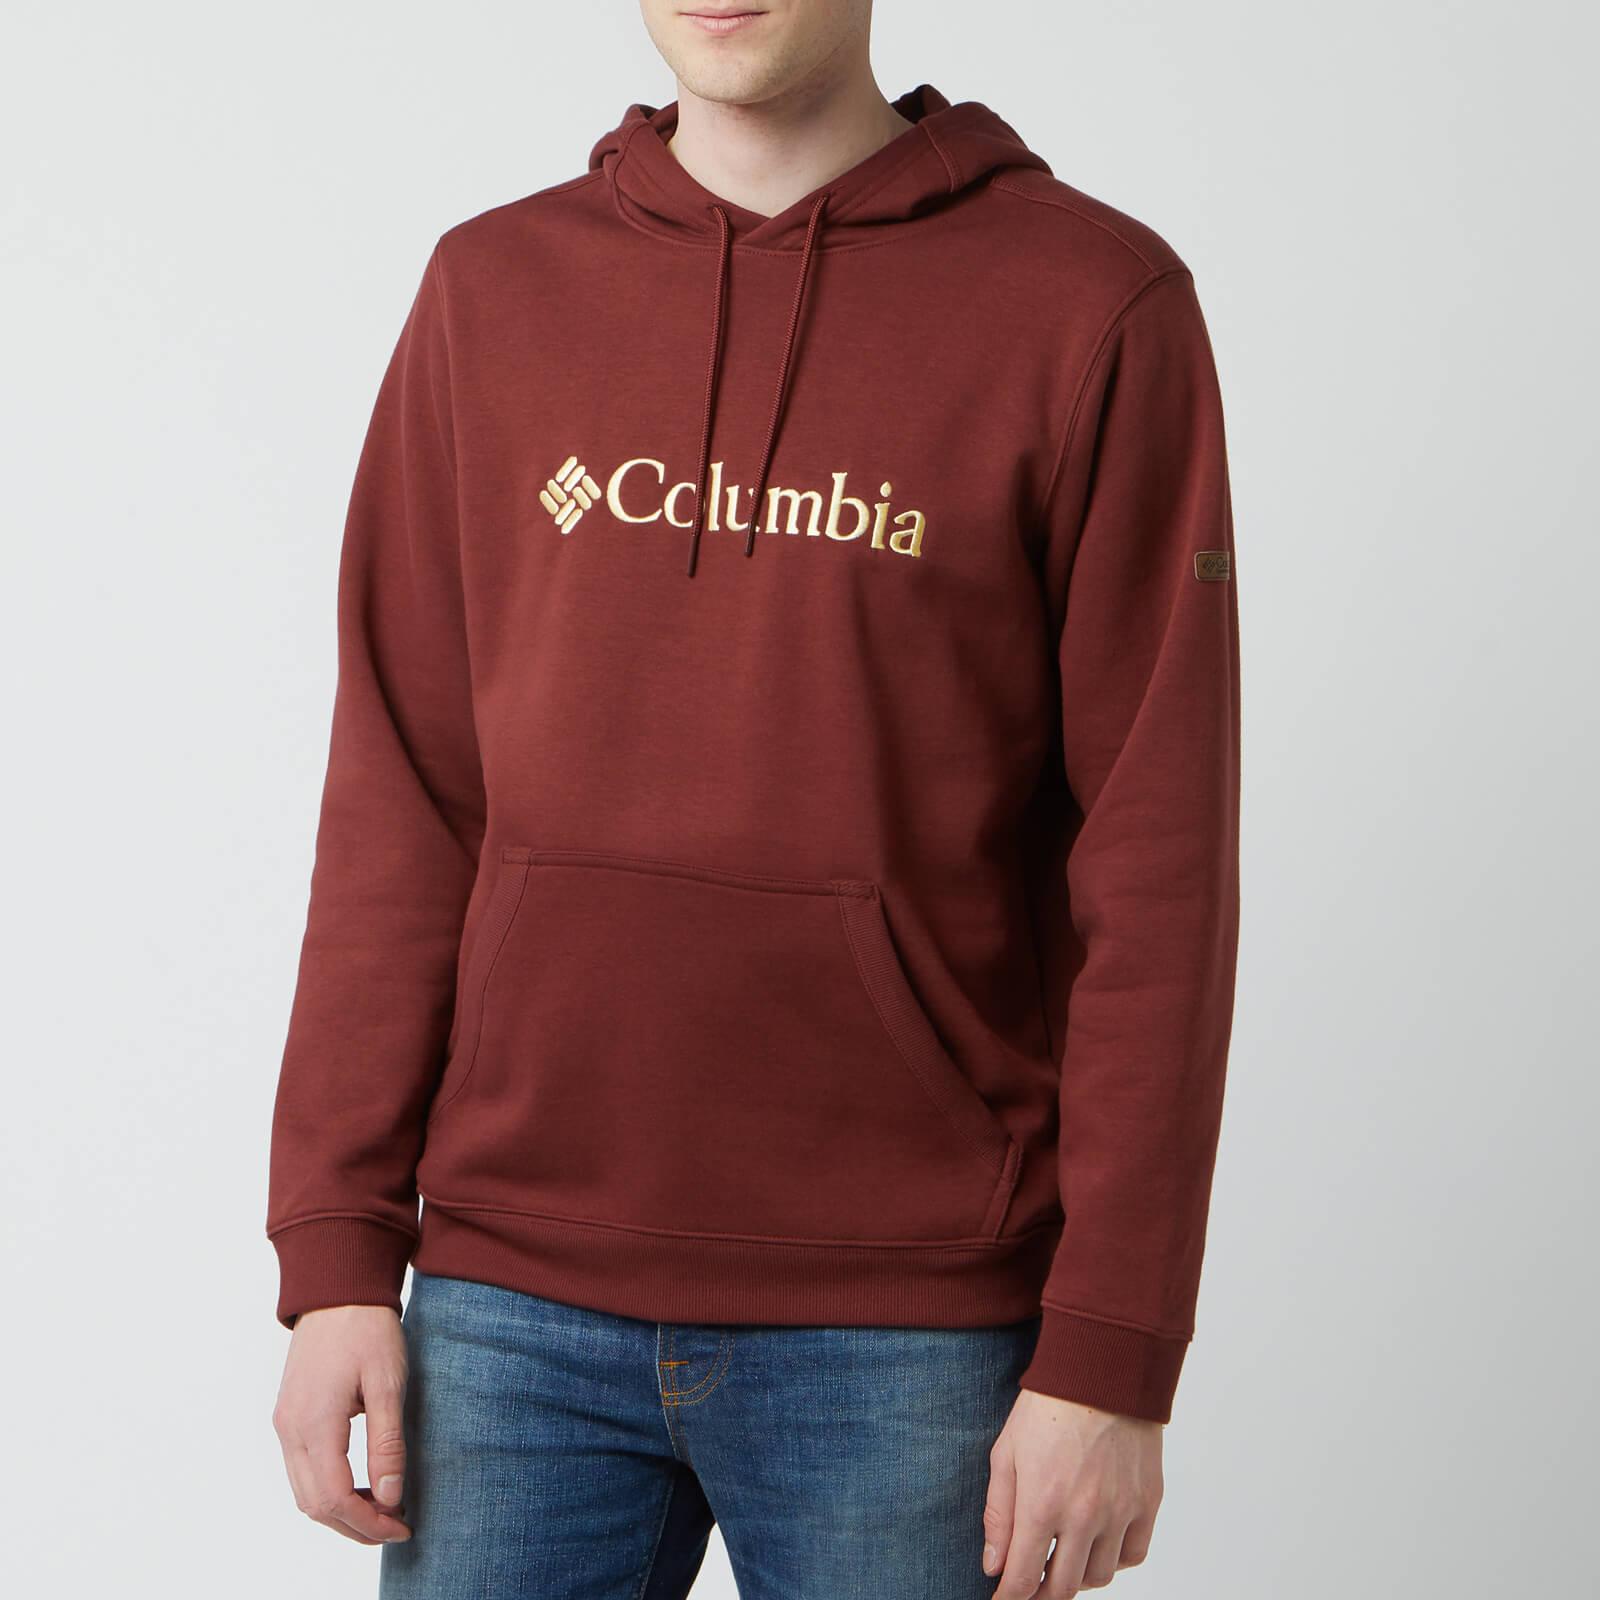 Columbia Men's CSC Basic Logo Hoodie - Tapestry - S - Red